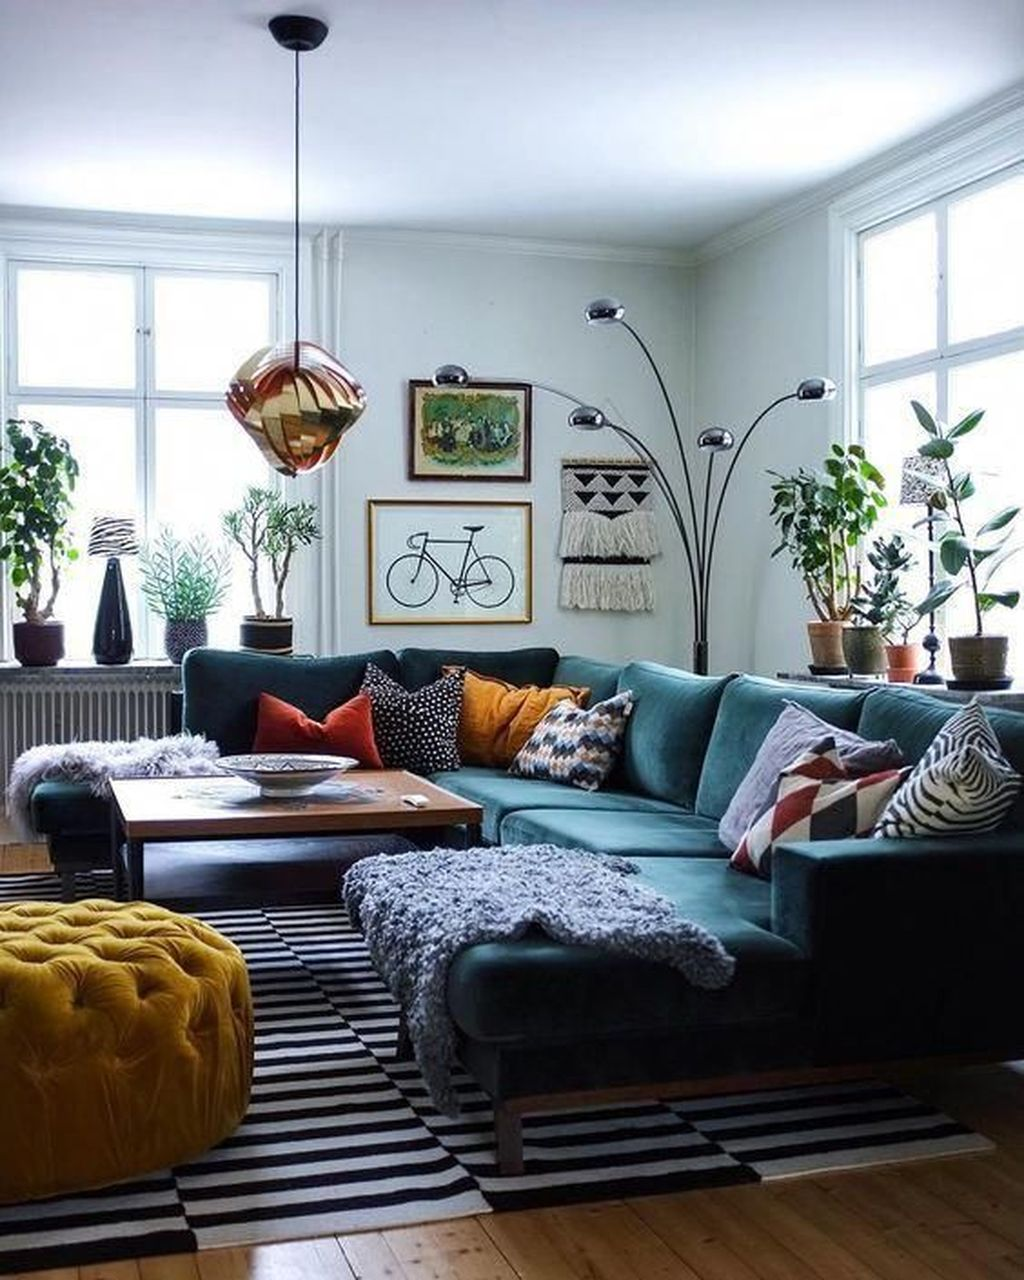 Inspiring Modern Home Furnishings Design Ideas 22